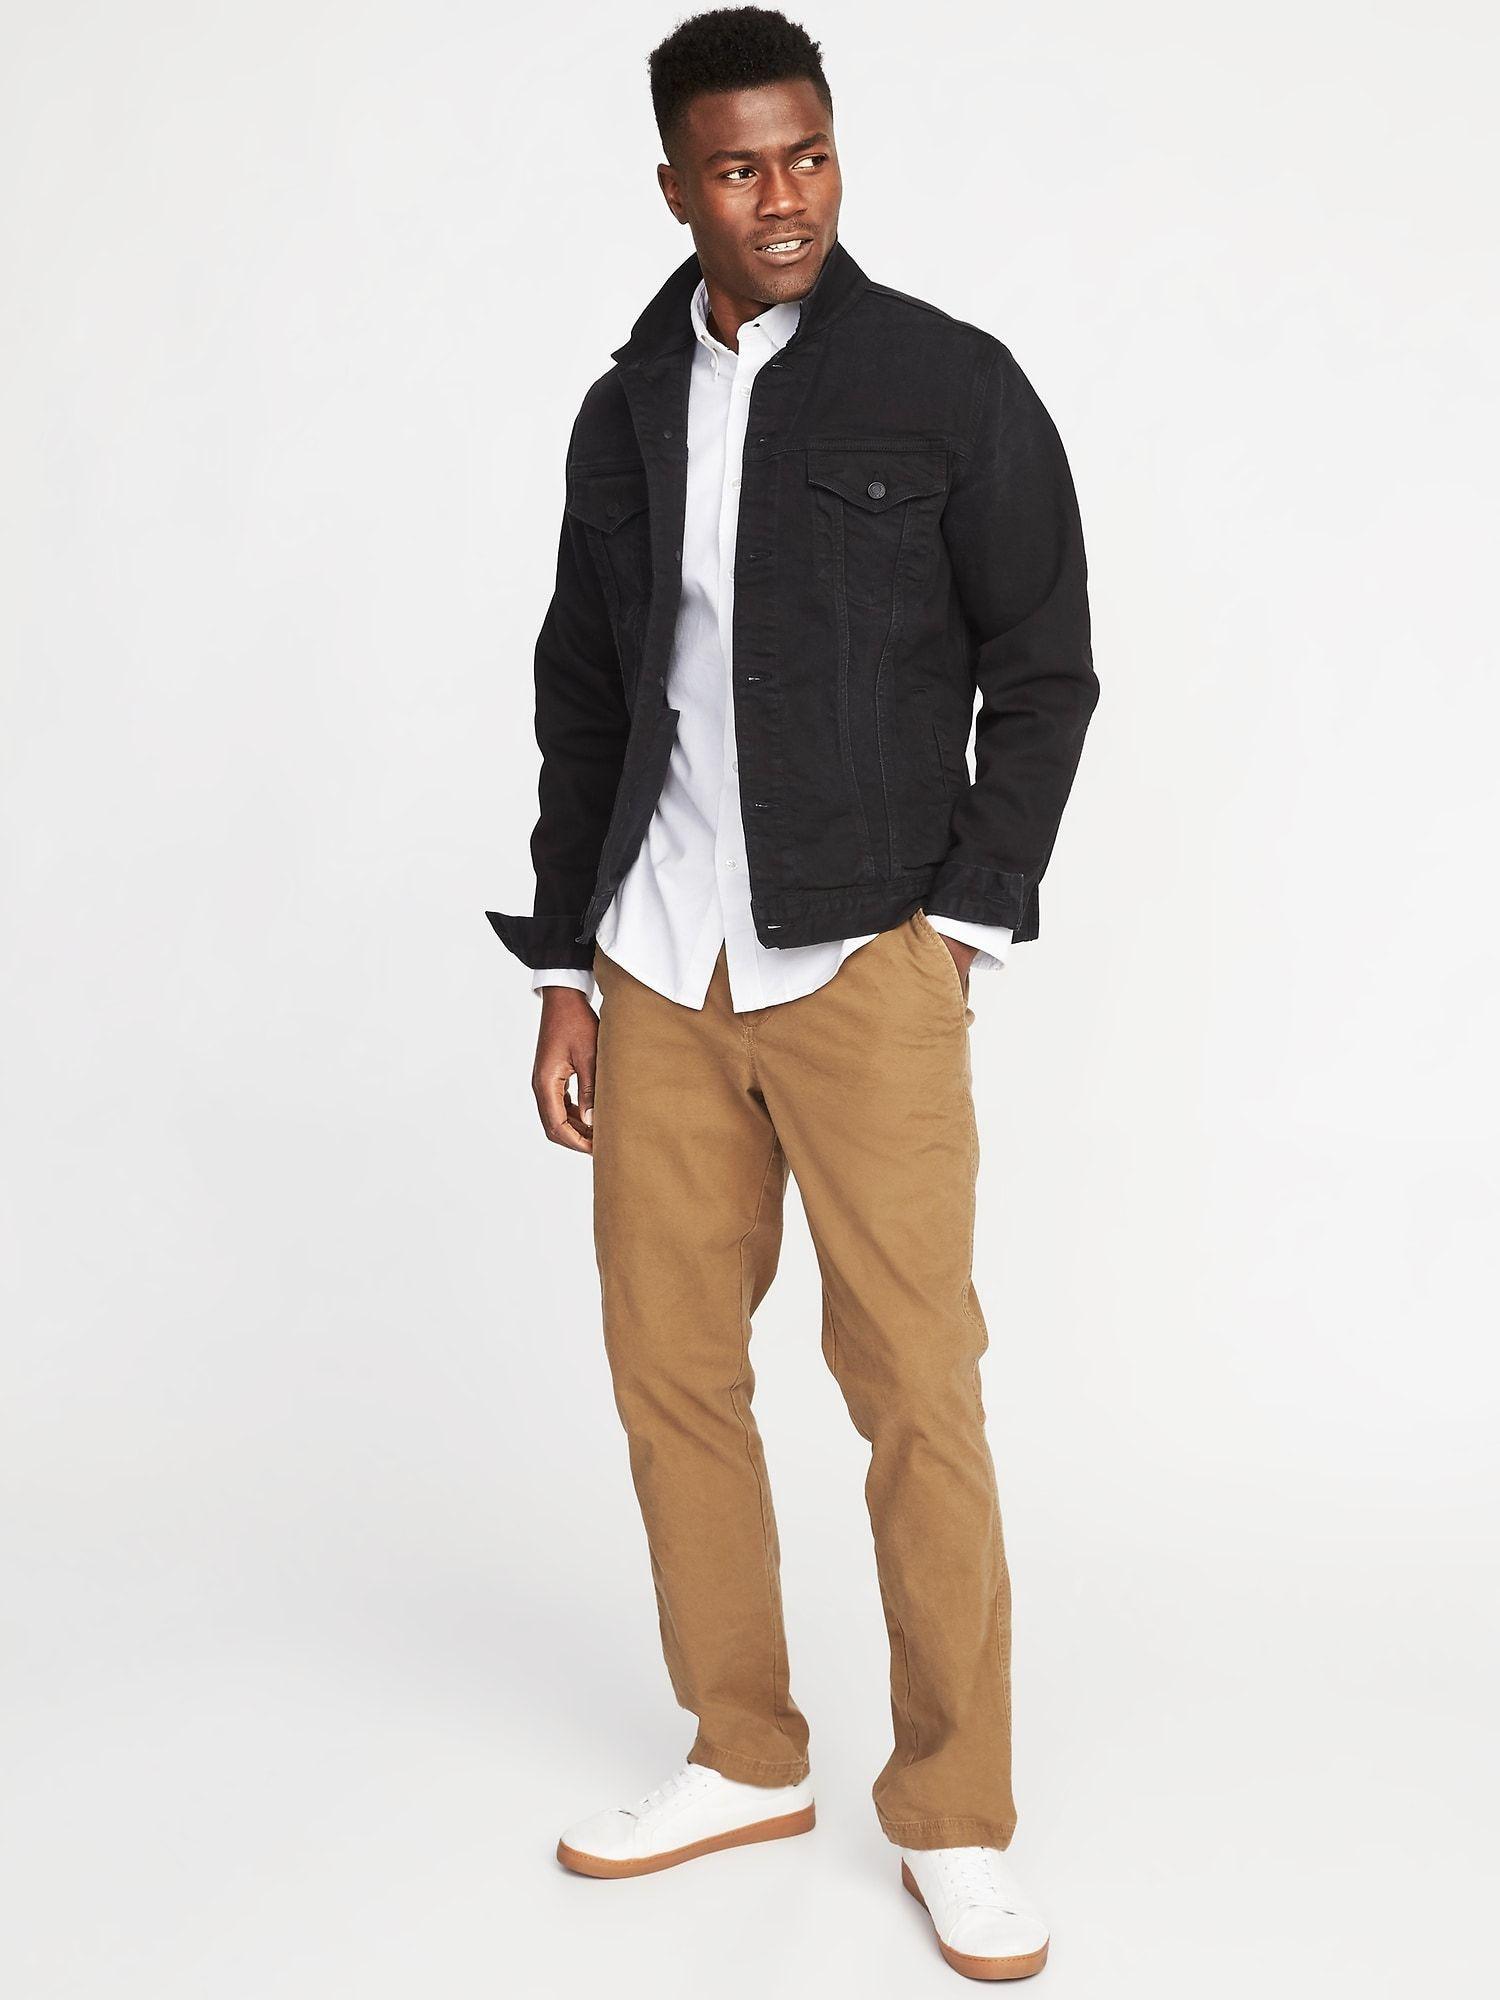 16++ Old navy black jeans ideas information